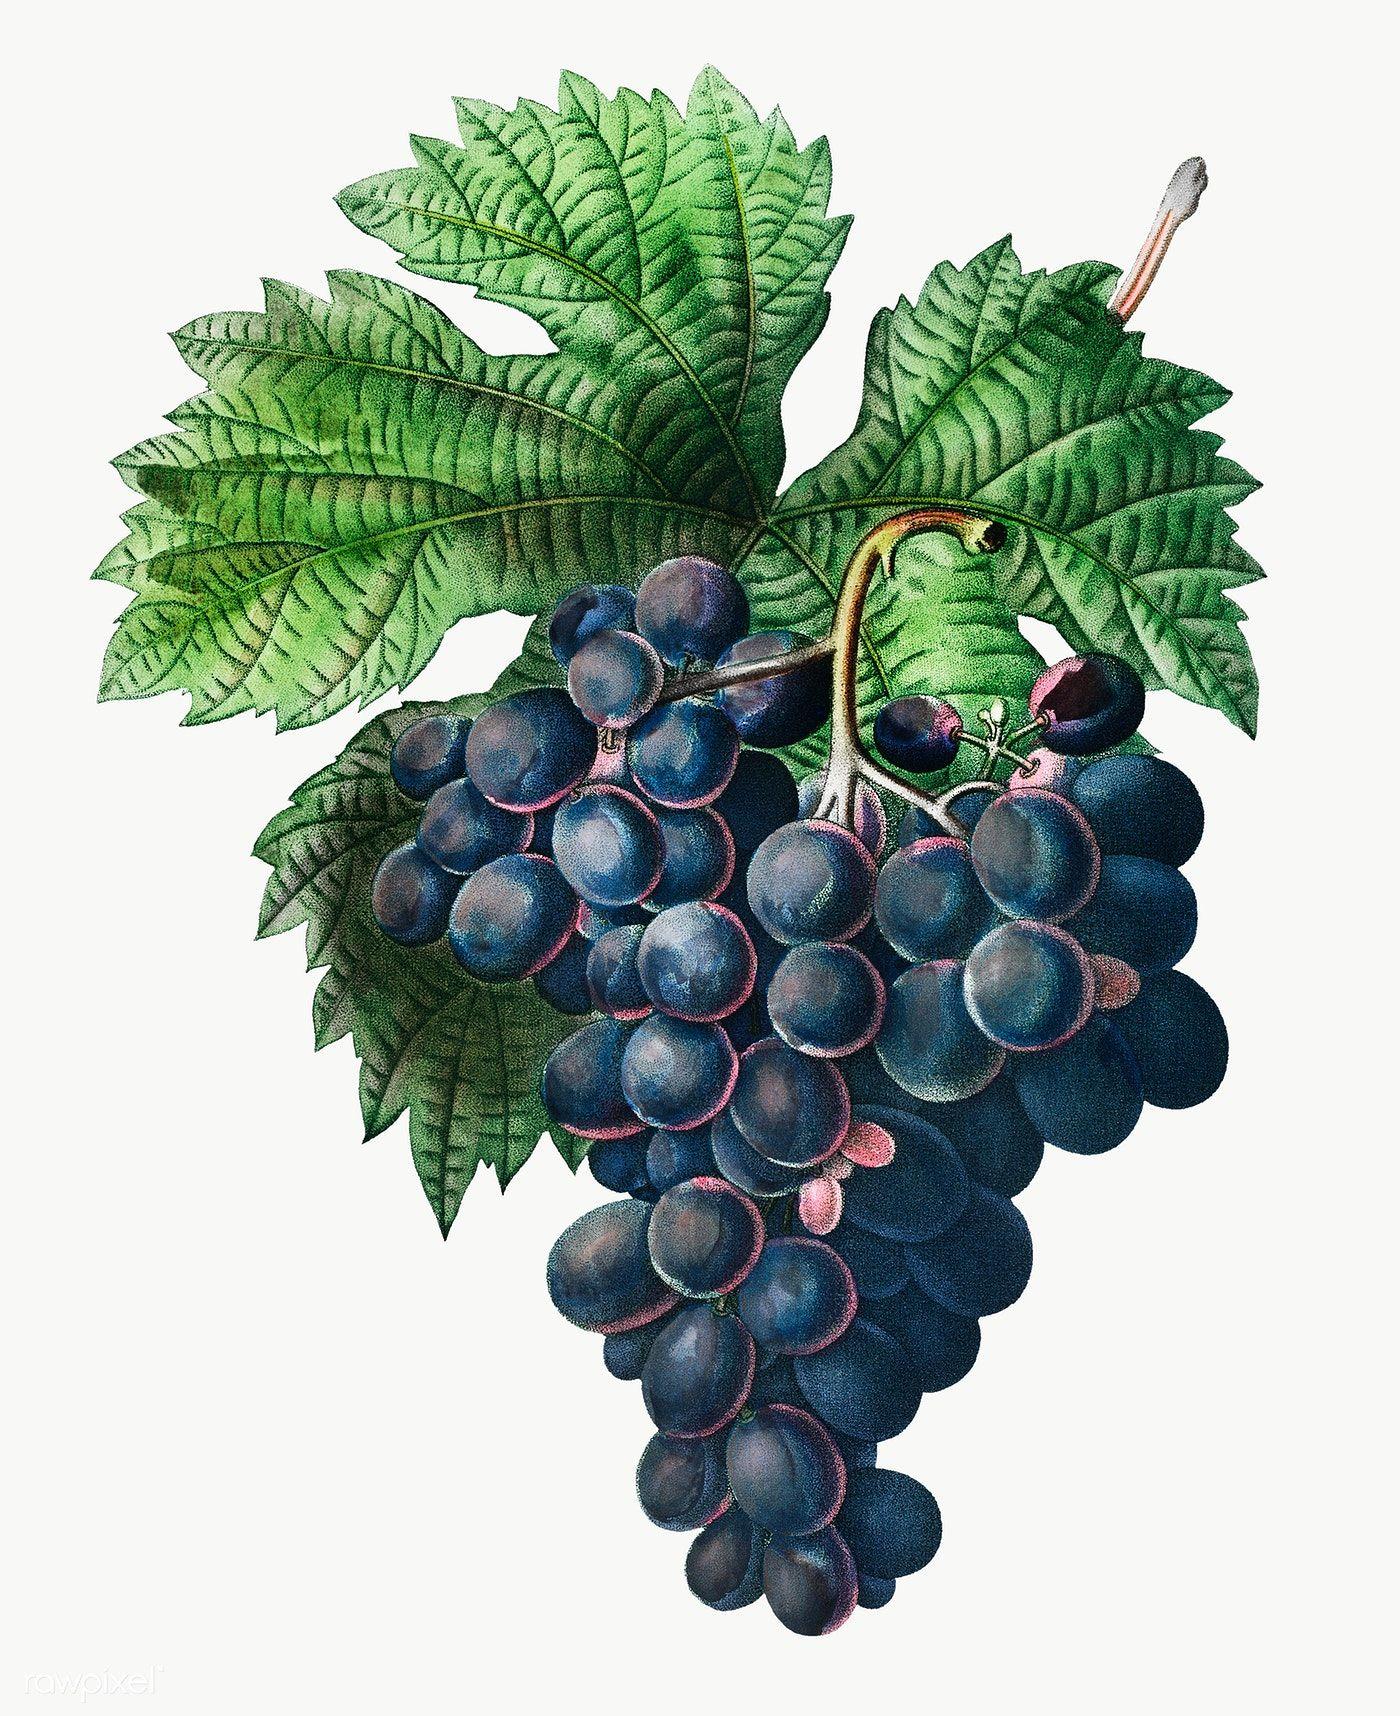 Blue Grape Vine Transparent Png Free Image By Rawpixel Com Vine Drawing Grapes Grape Vines